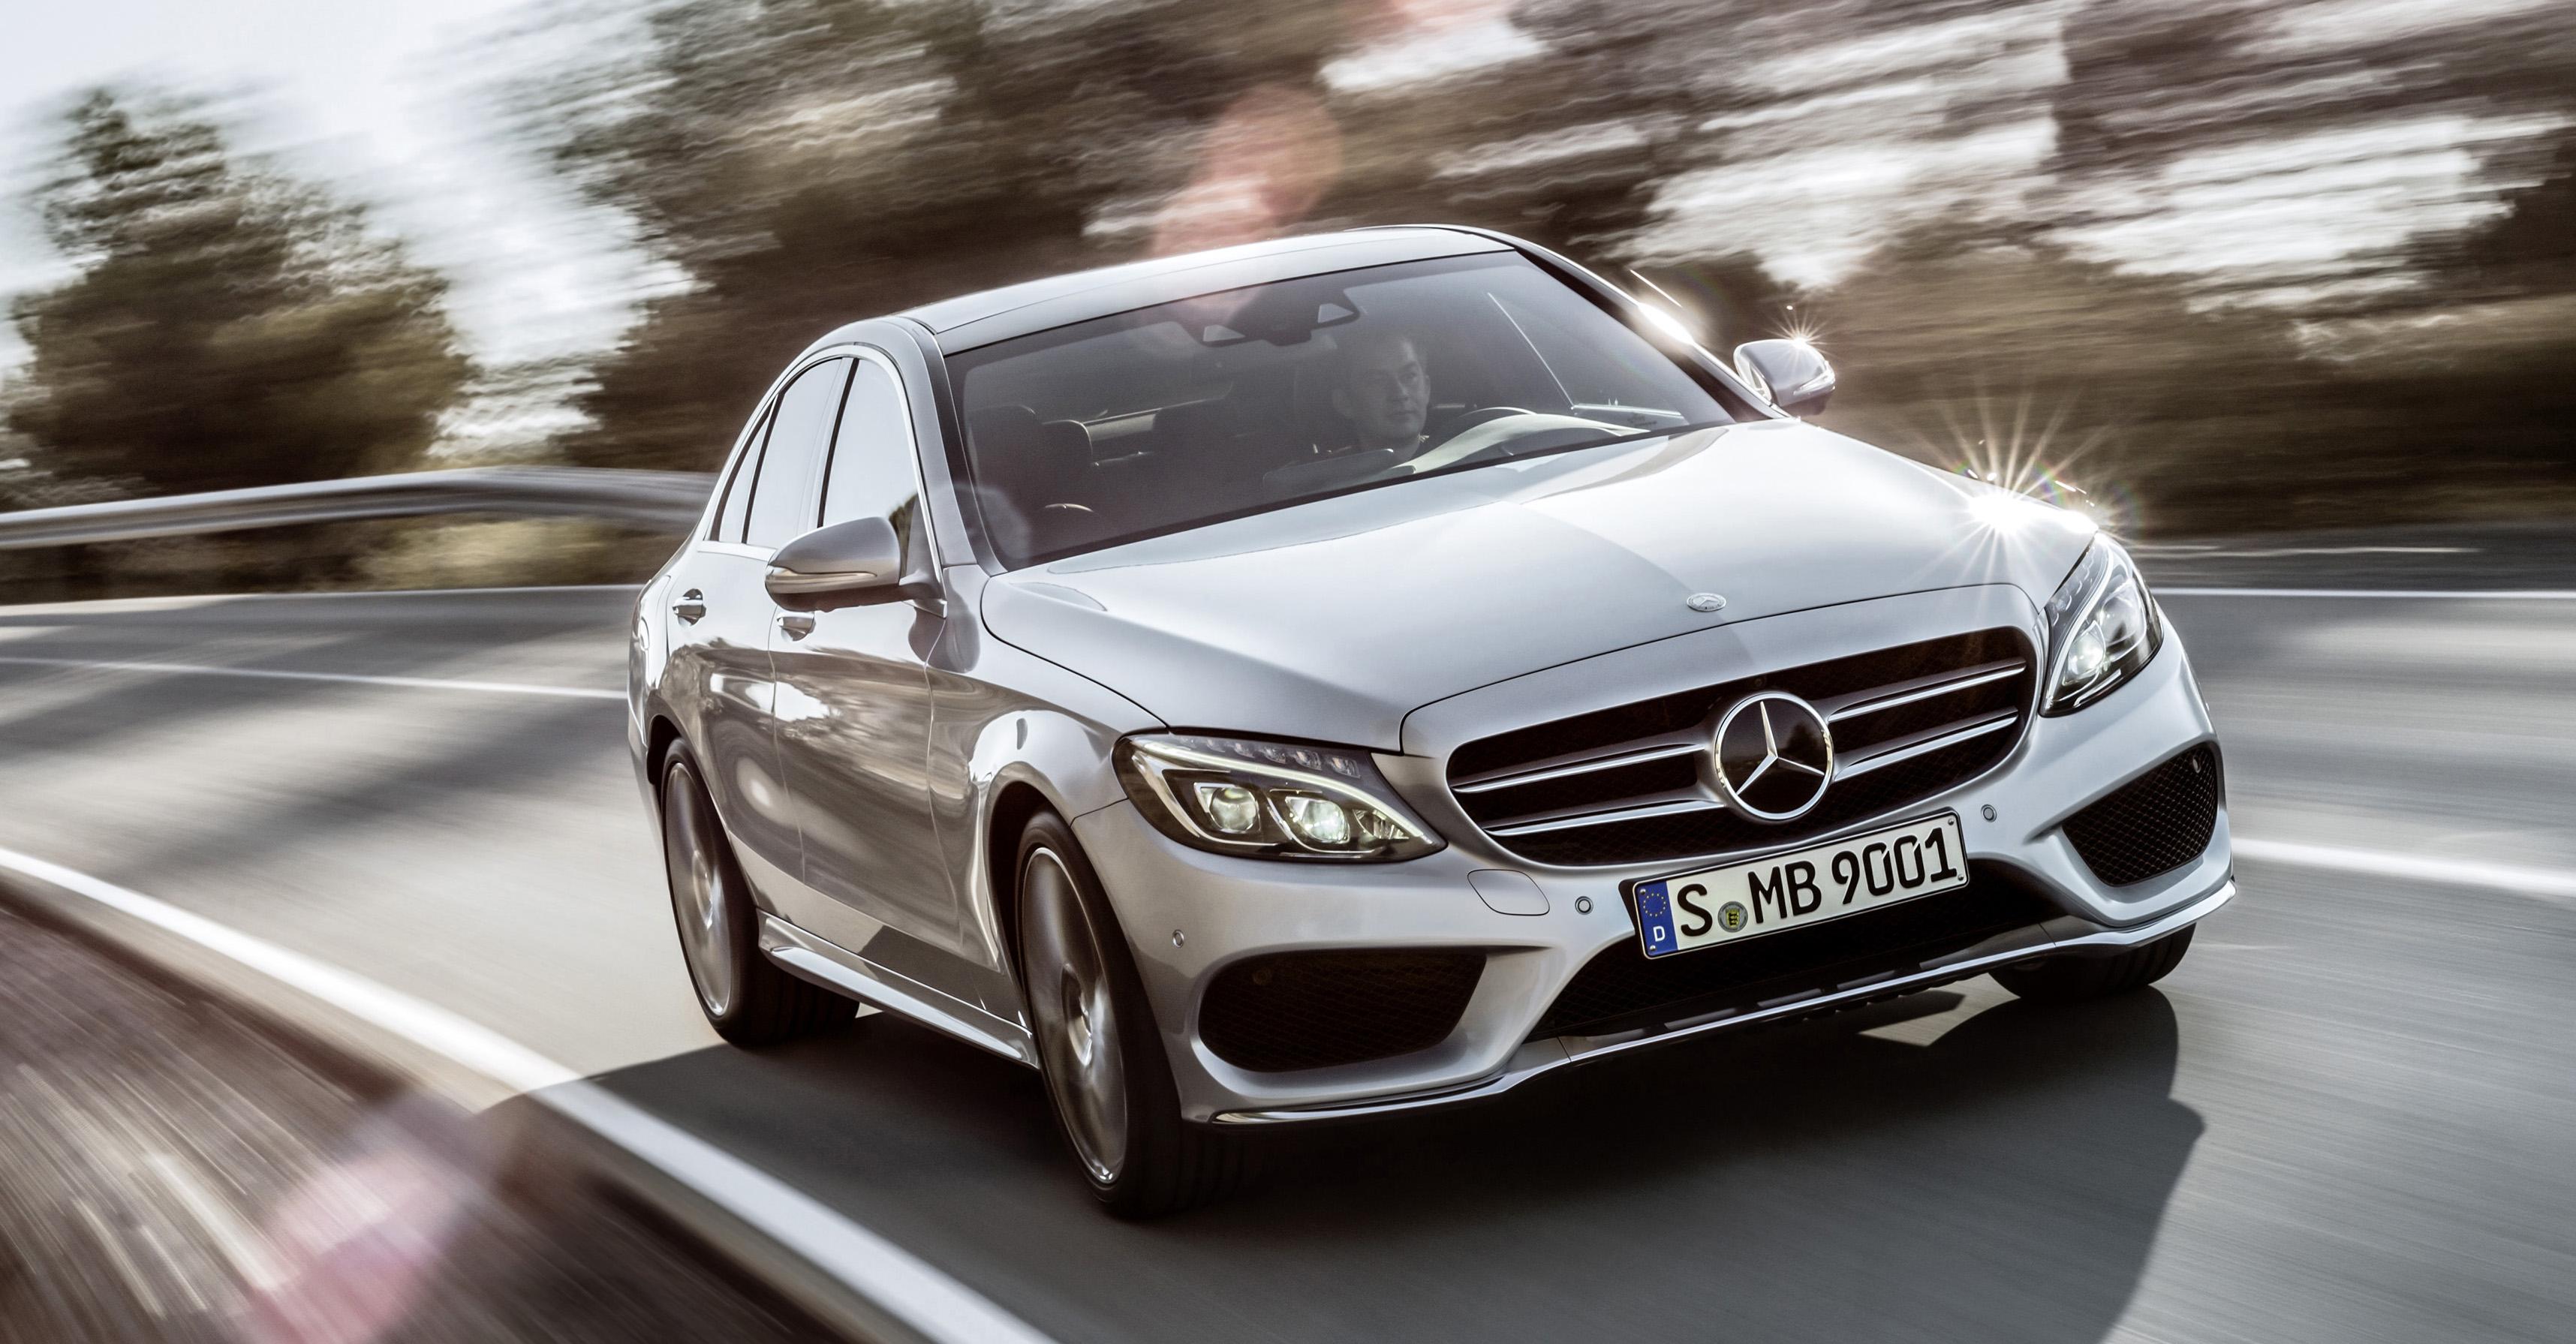 Mercedes-Benz C-klasse AMG IV (W205) 2014 - now Sedan #2